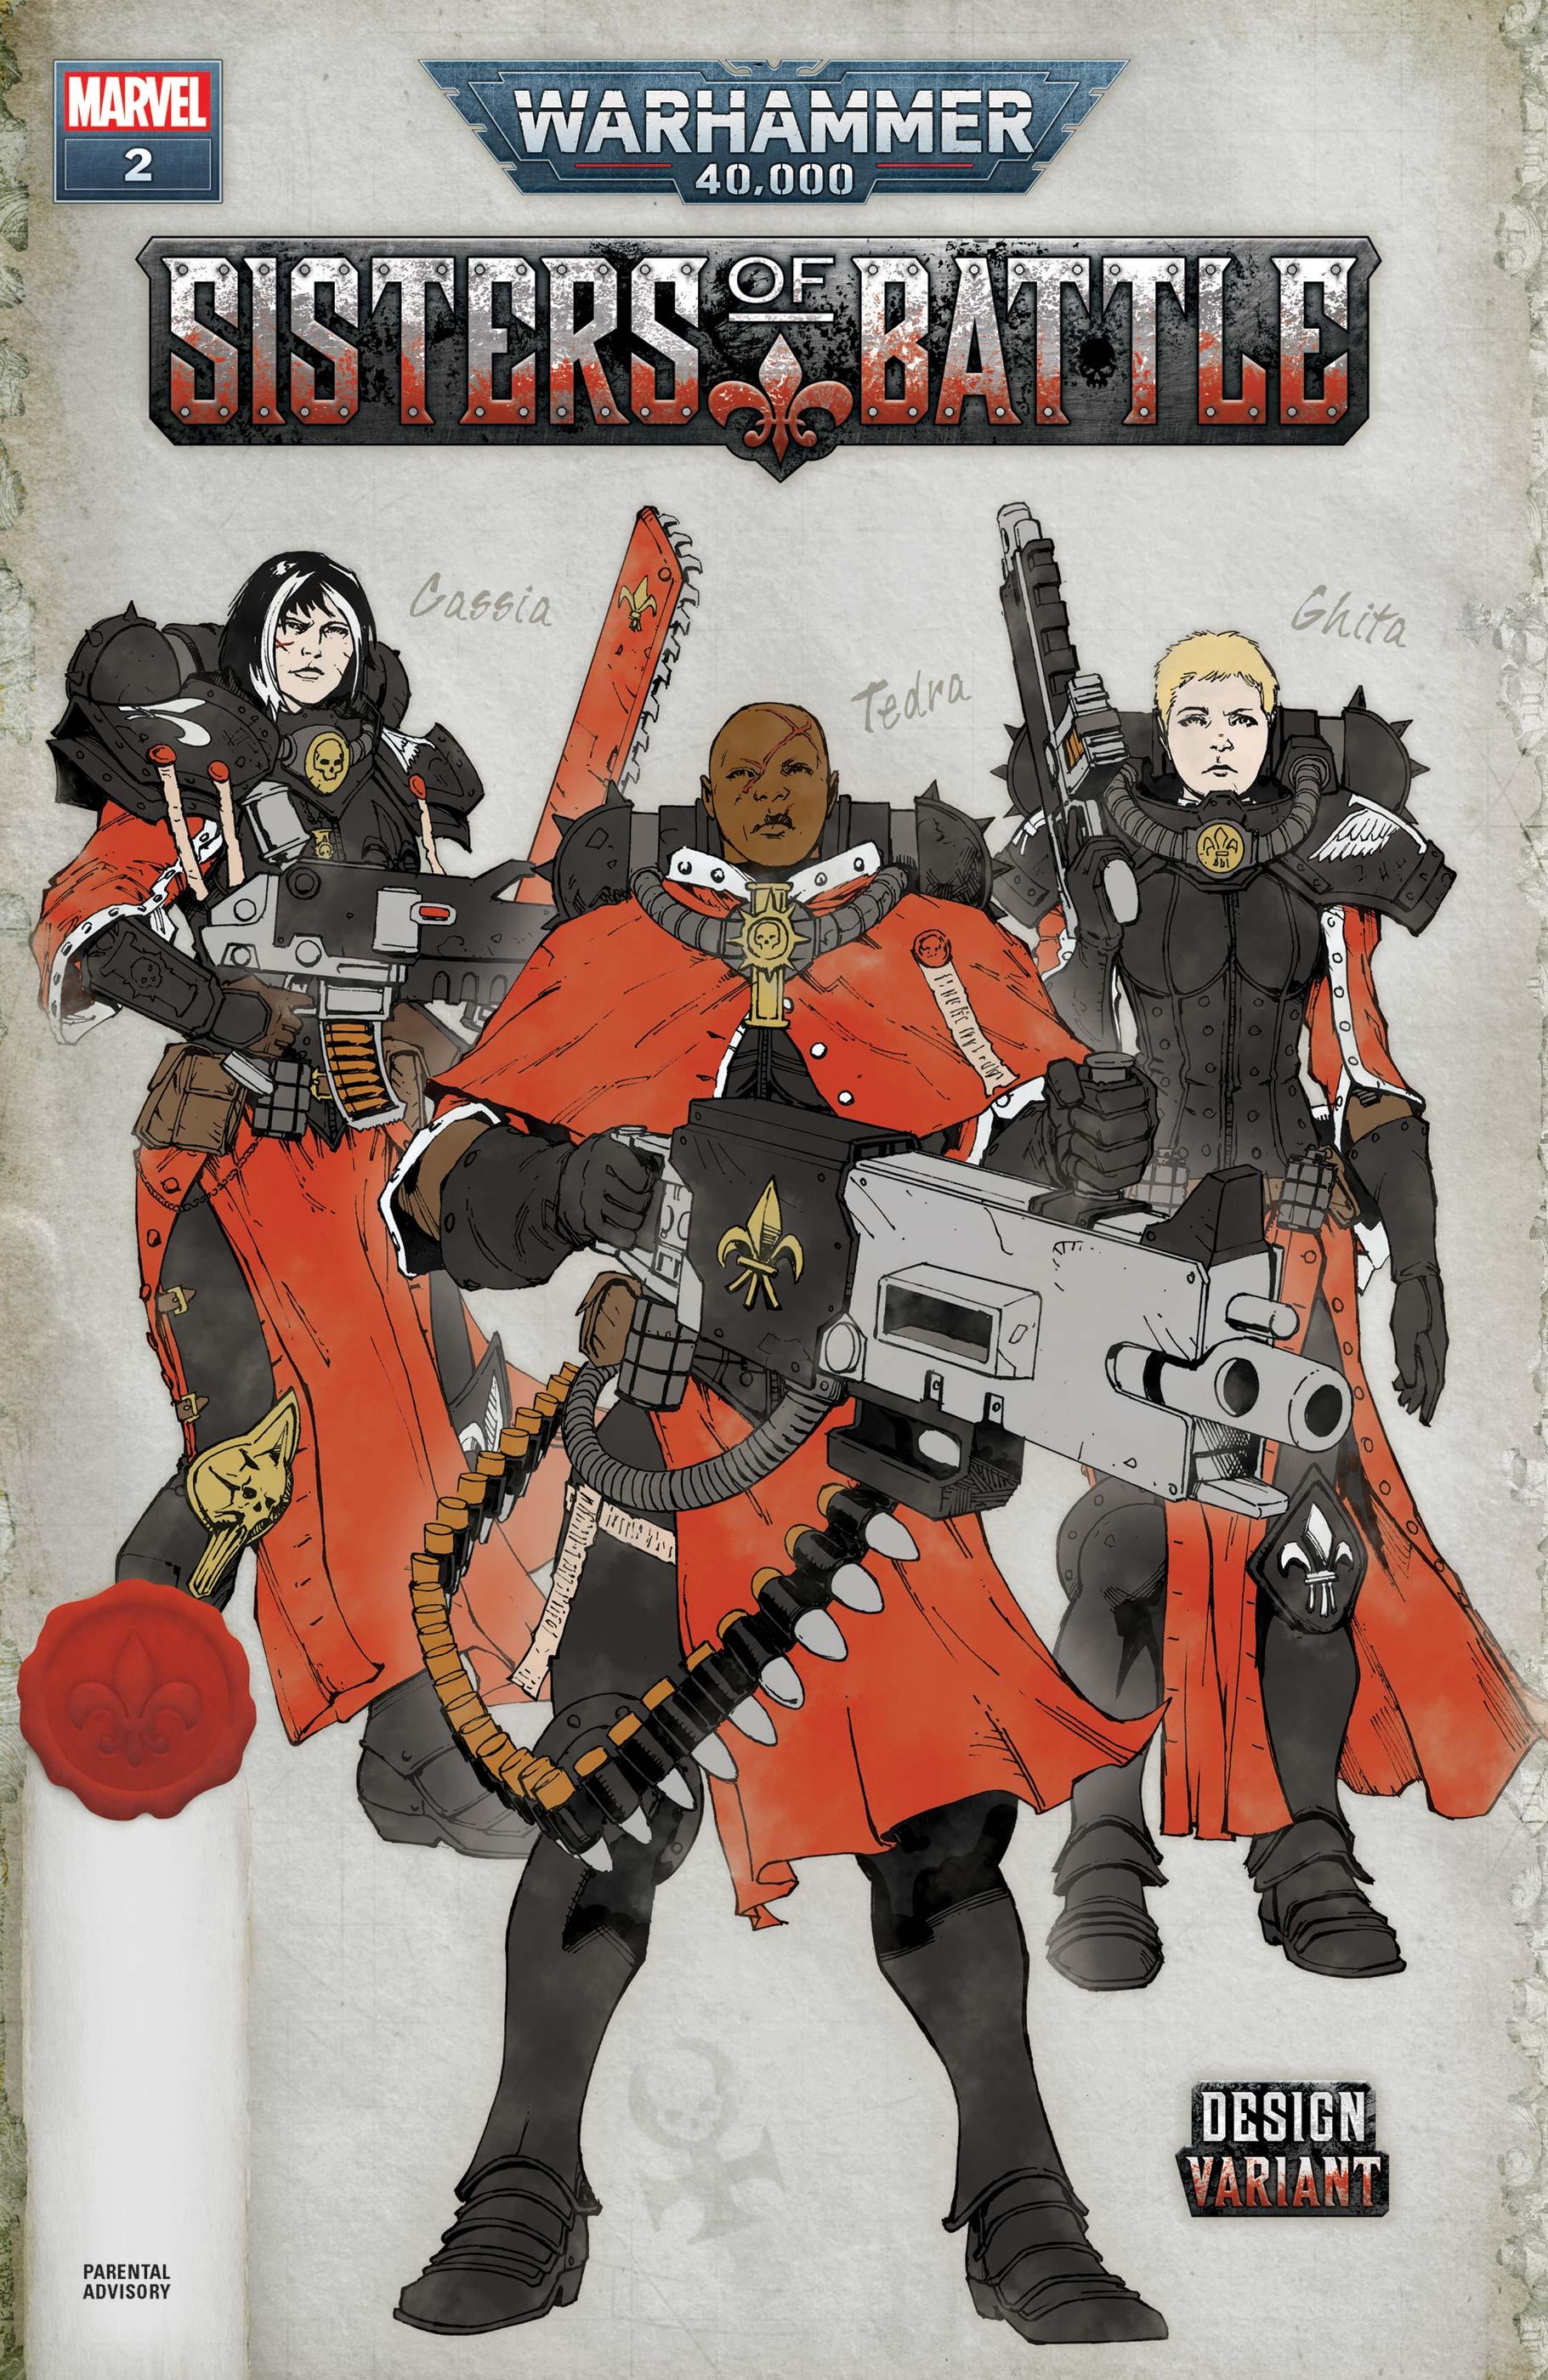 Warhammer 40,000: Sisters of Battle (2021) #2 (Variant)